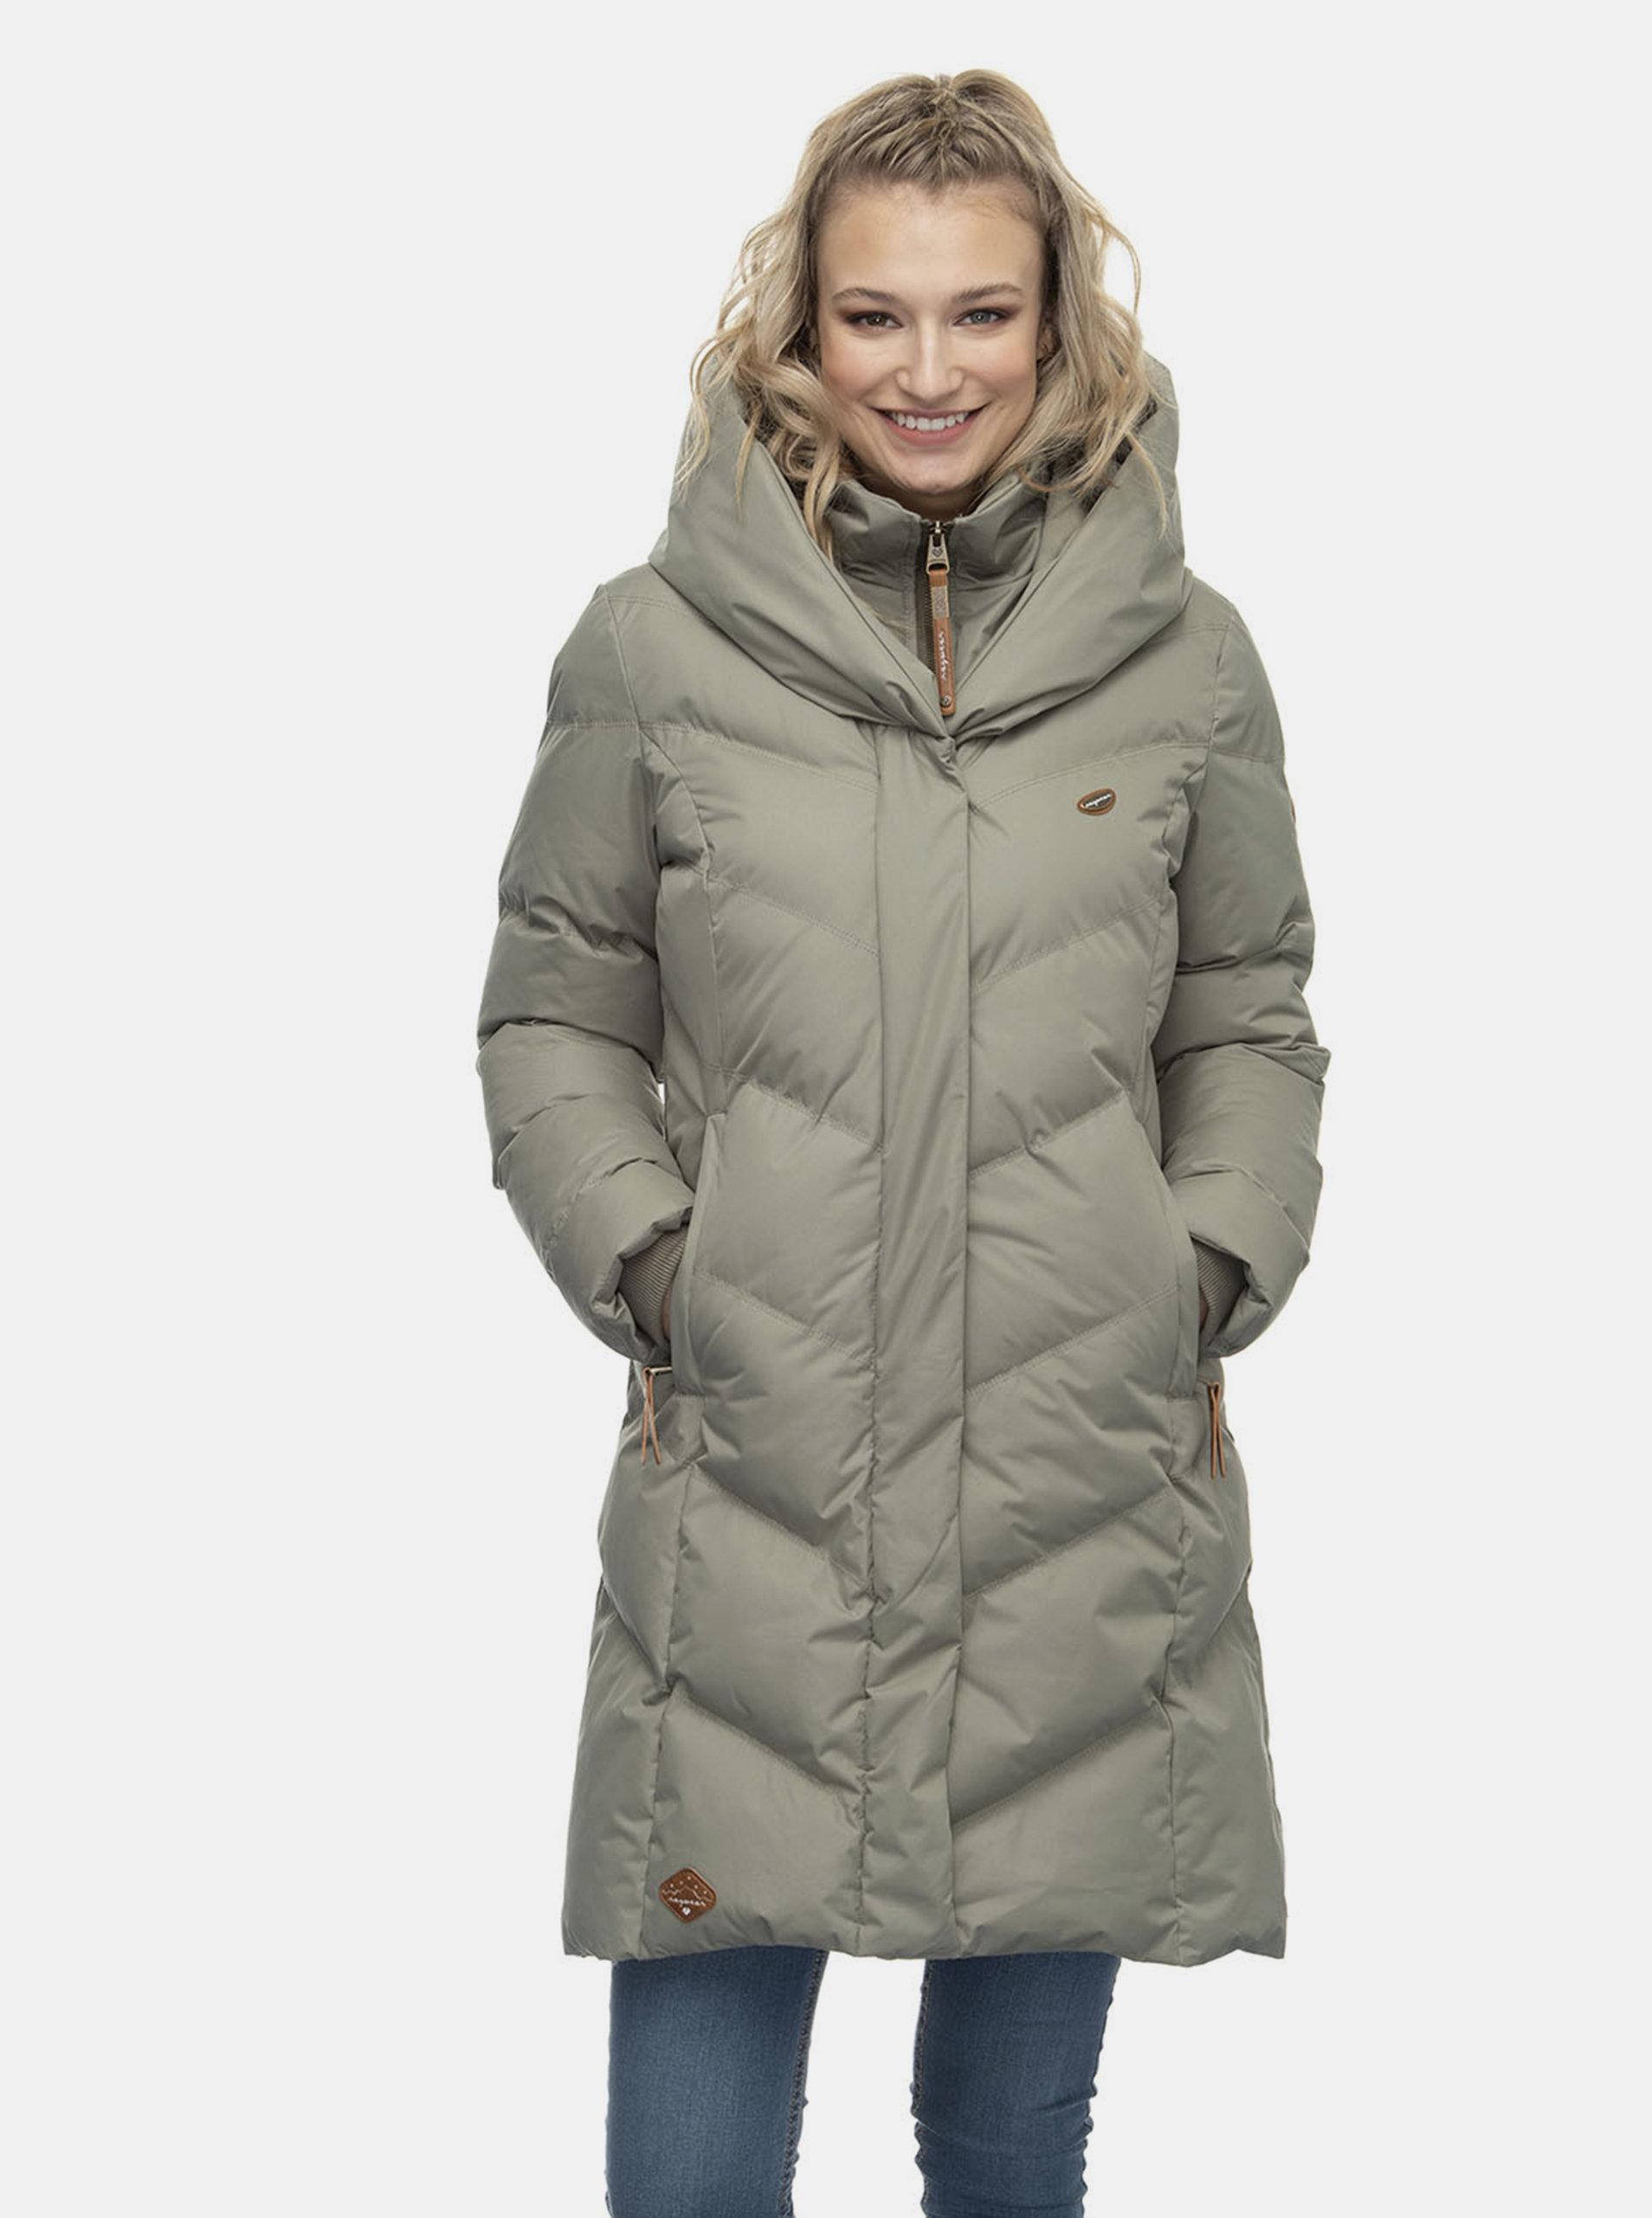 Khaki dámský prošívaný zimní kabát Ragwear